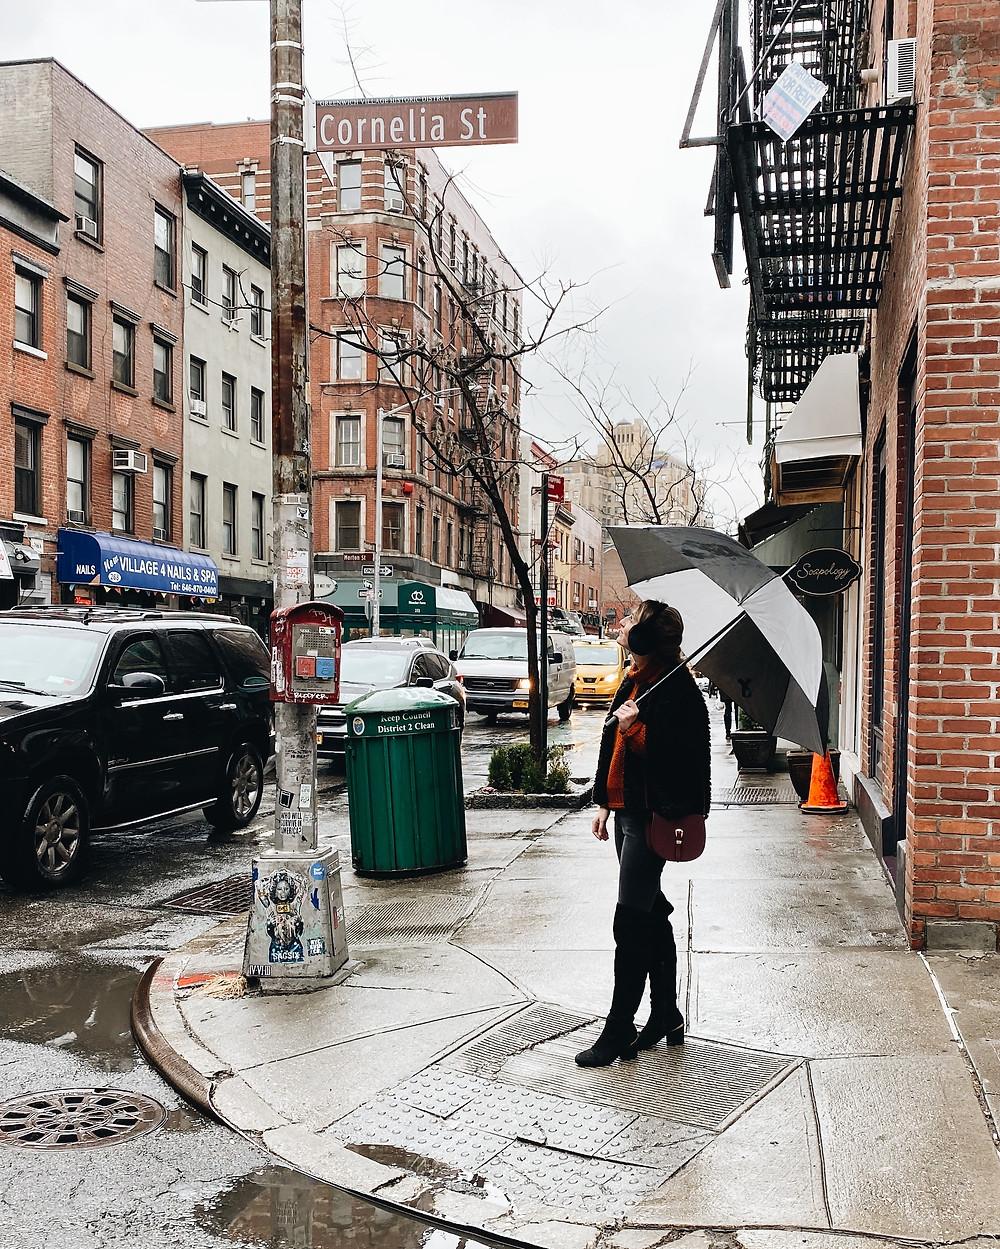 Cornelia Street, New York City, West Village